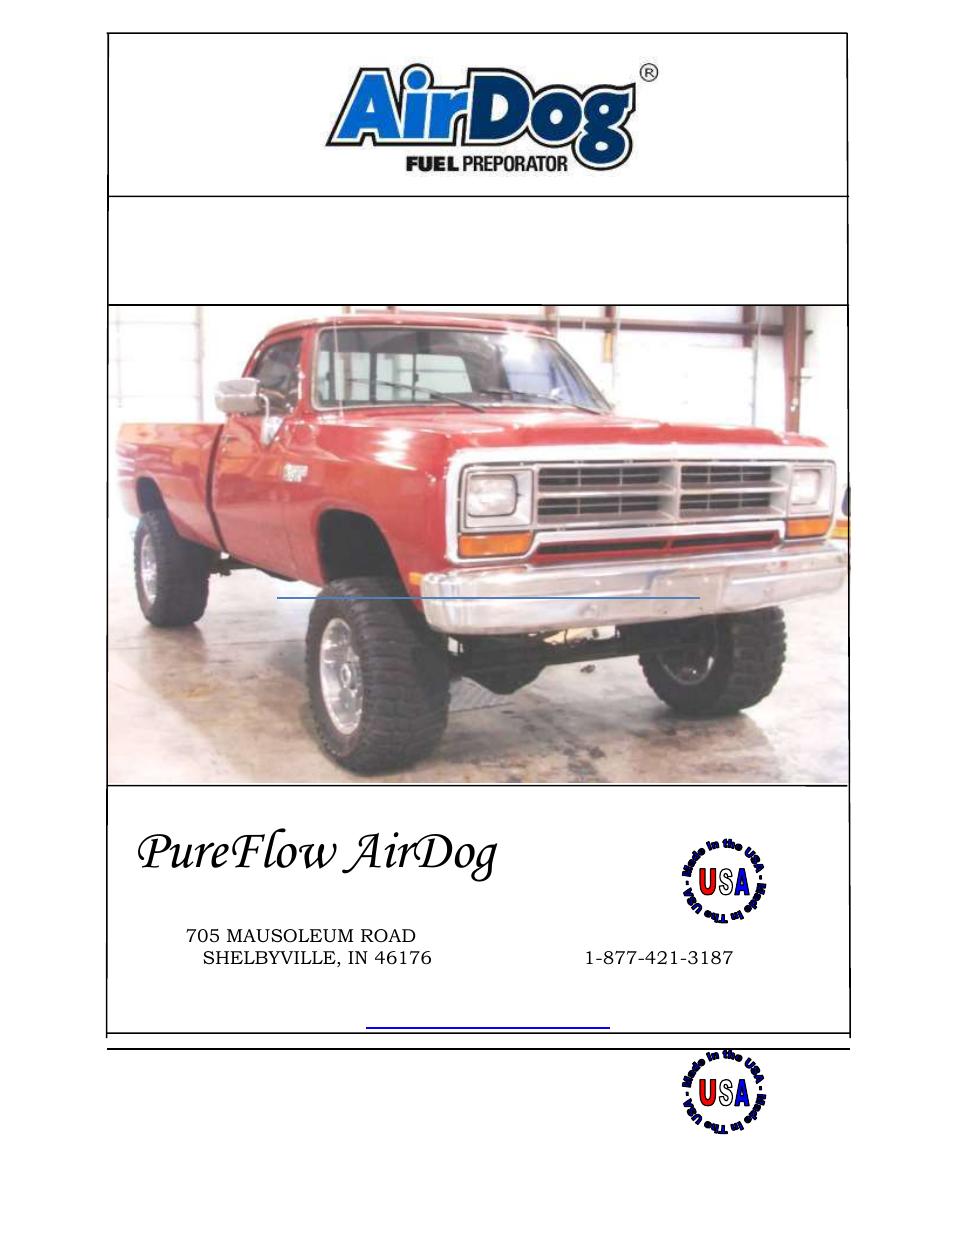 PureFlow AirDog FP-150 - Dodge Cummins 1989-1993 User Manual | 27 pages |  Also for: FP-100 - Dodge Cummins 1989-1993